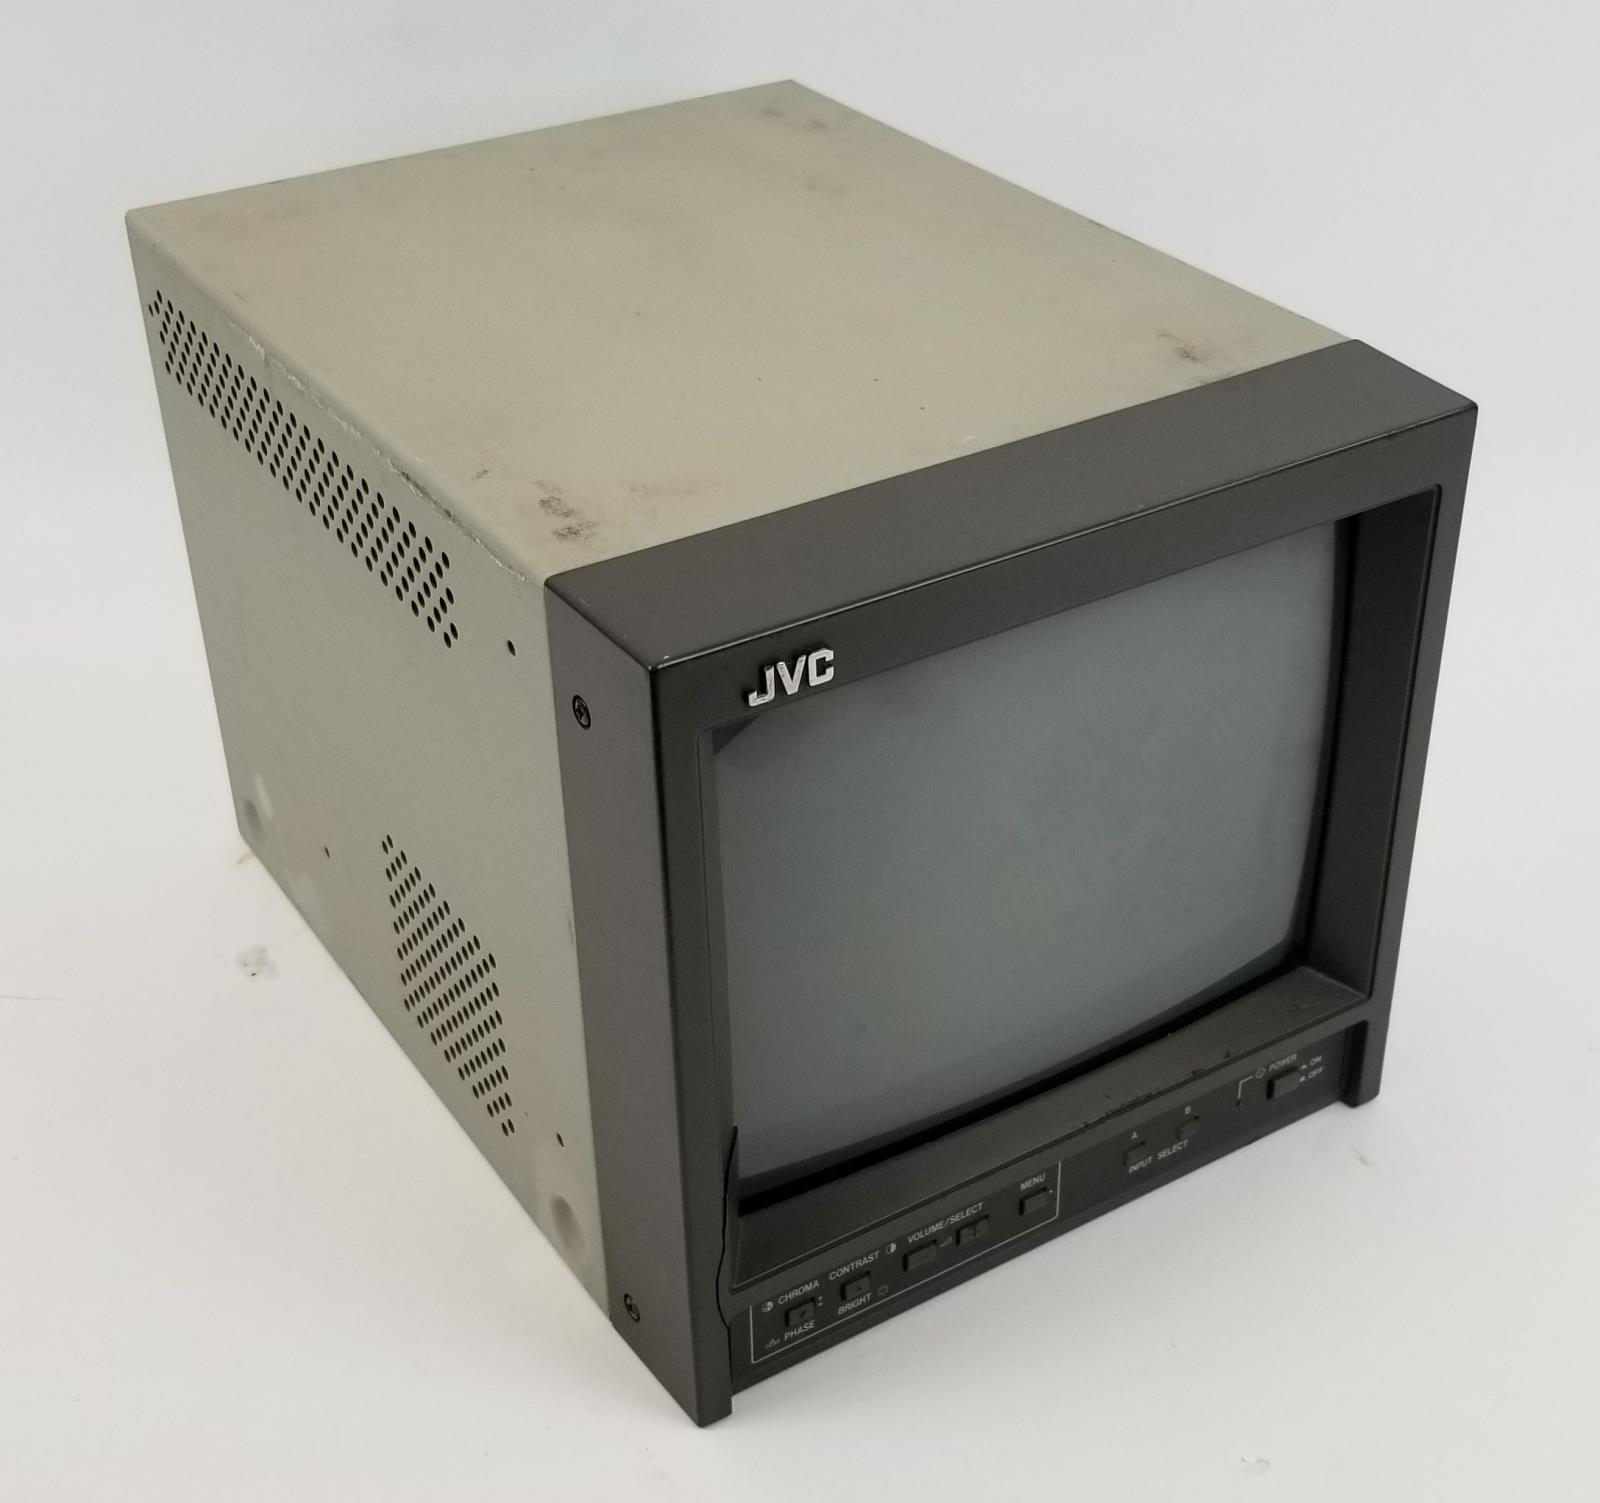 "JVC TM-A101G 9"" Professional Color CRT Video Monitor"